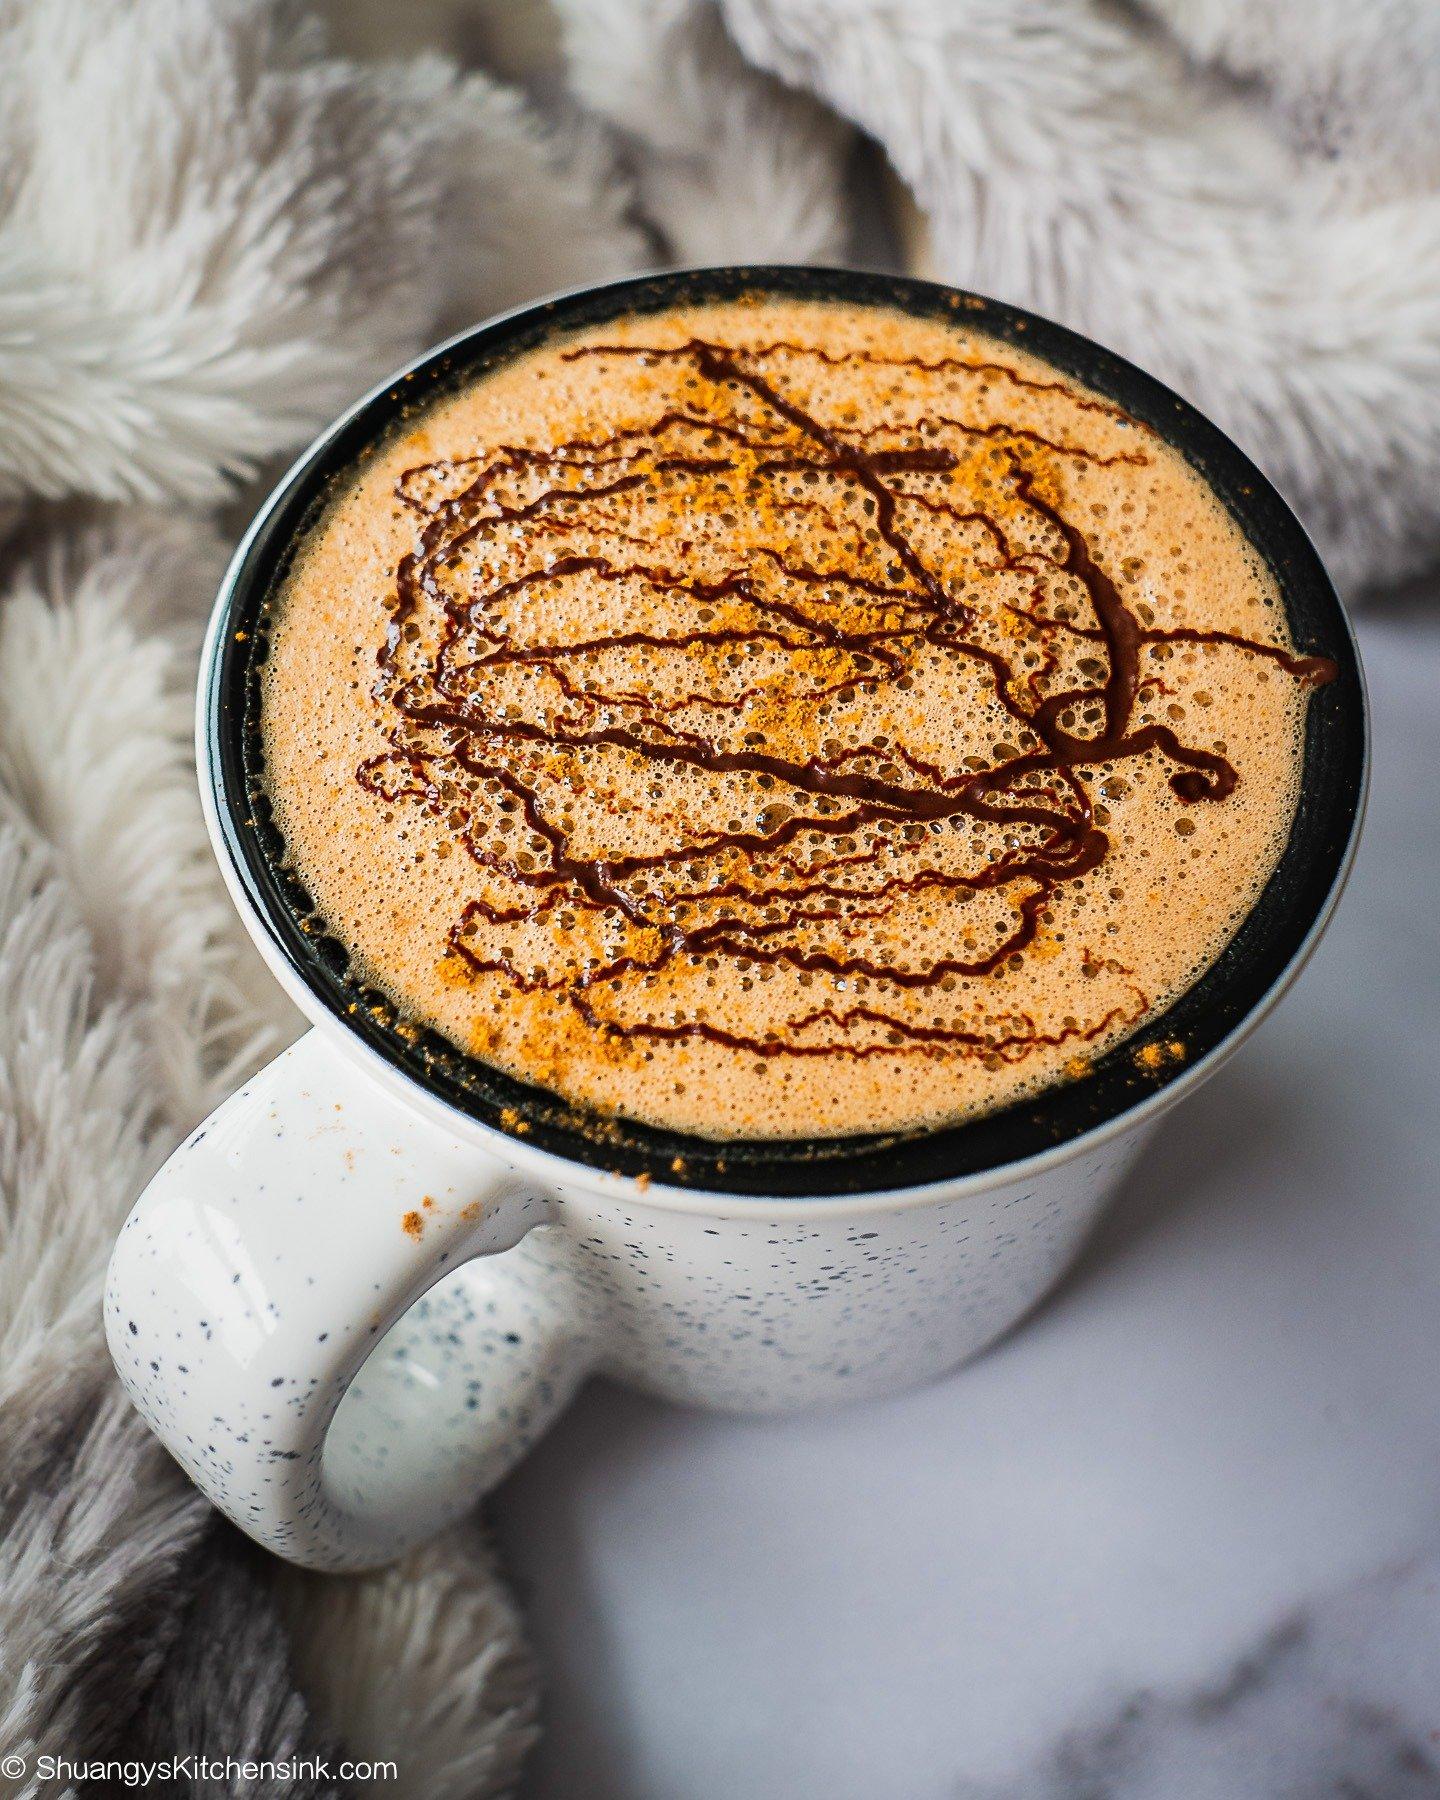 A frothy homemade mocha latte